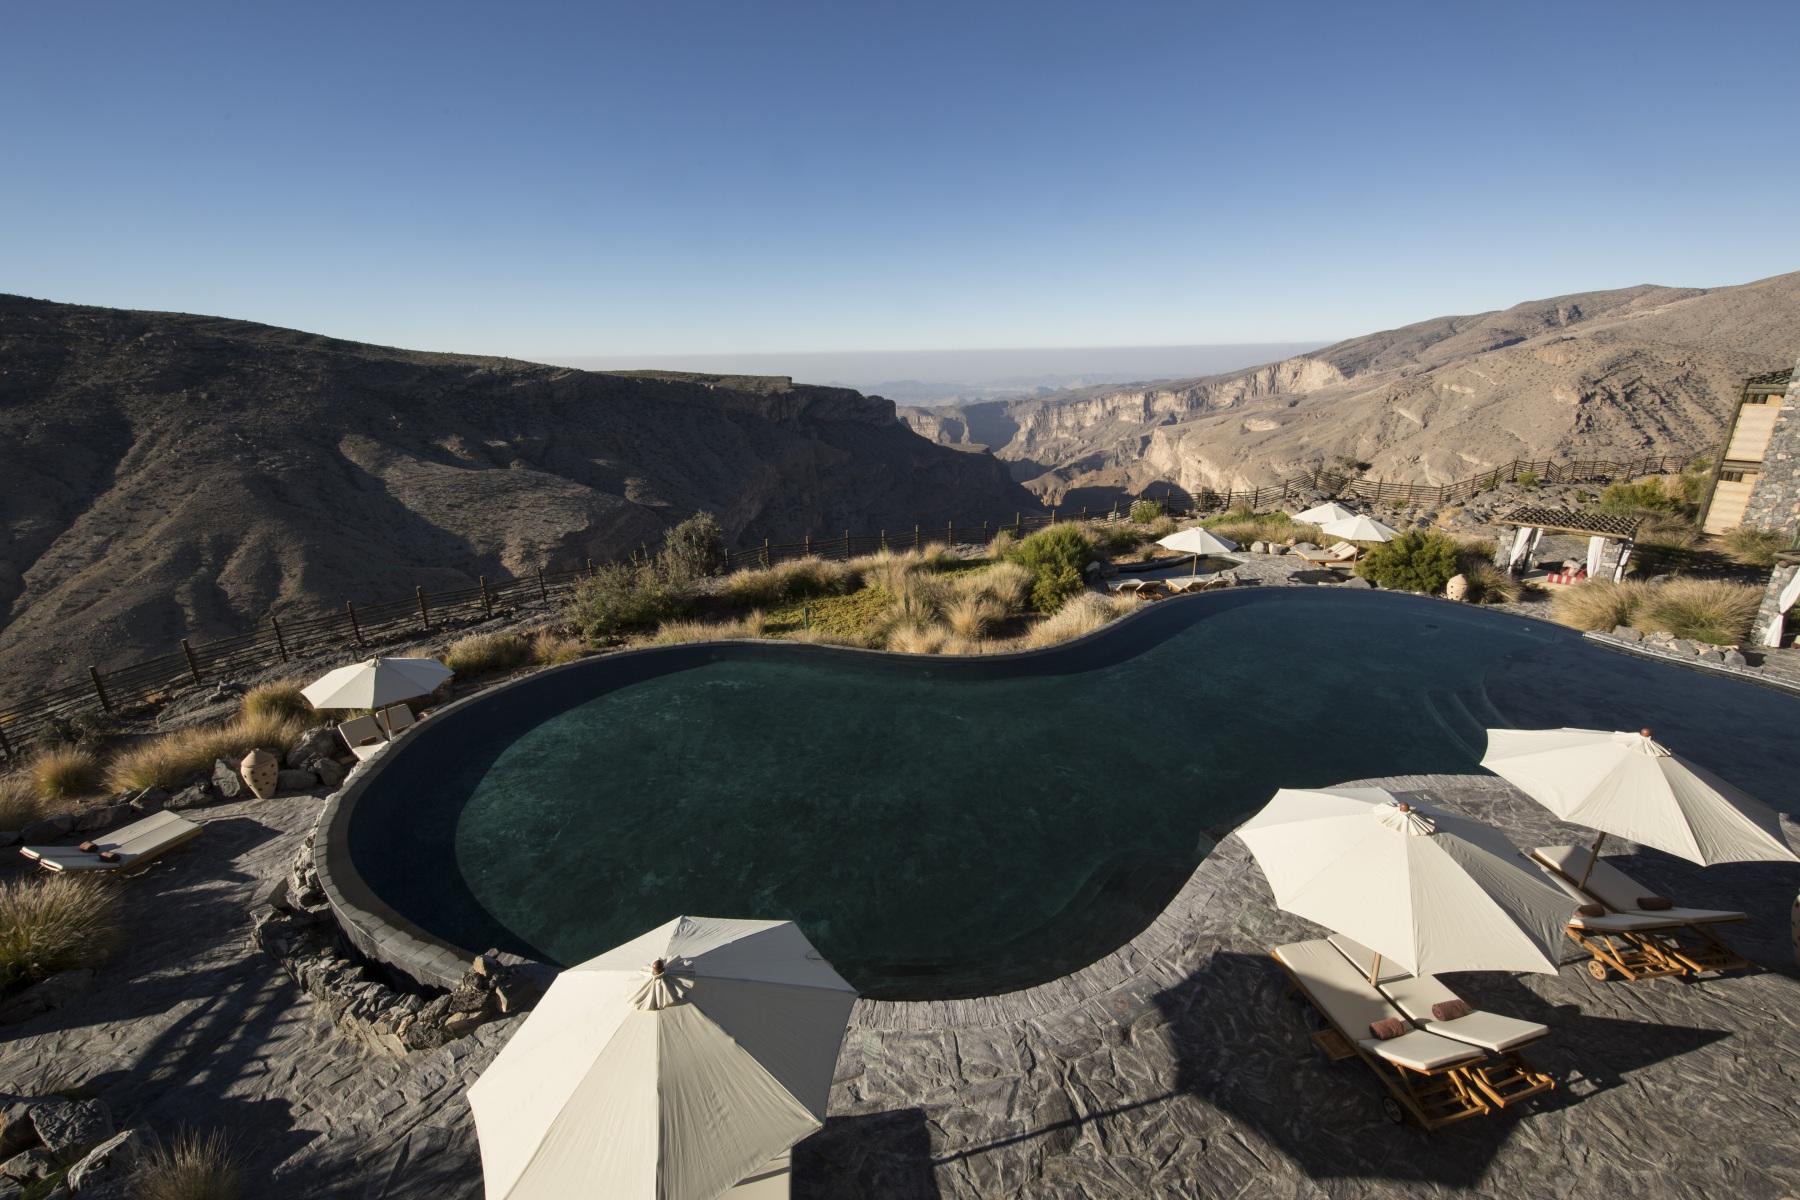 Alila-Jabal-Akhdar-Infinity-Pool-14